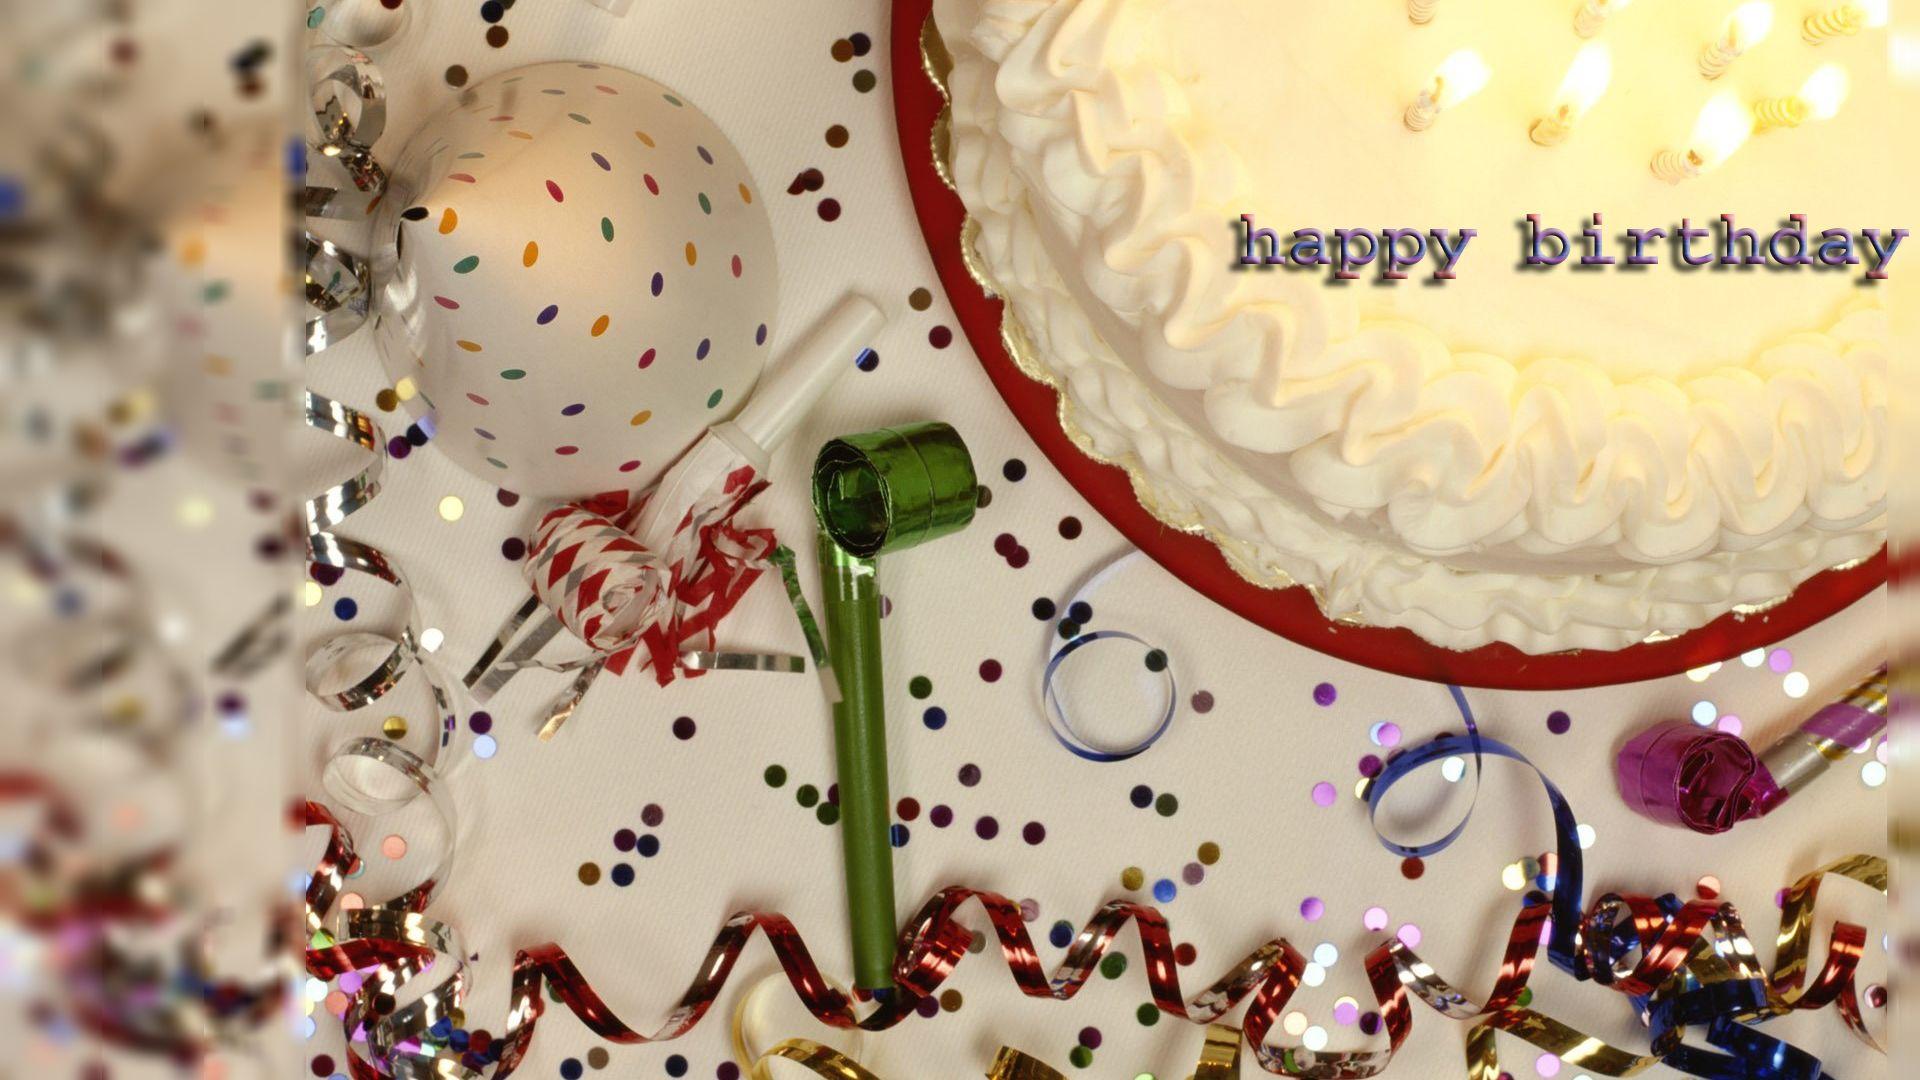 happy birthday wallpaper hd Google Search